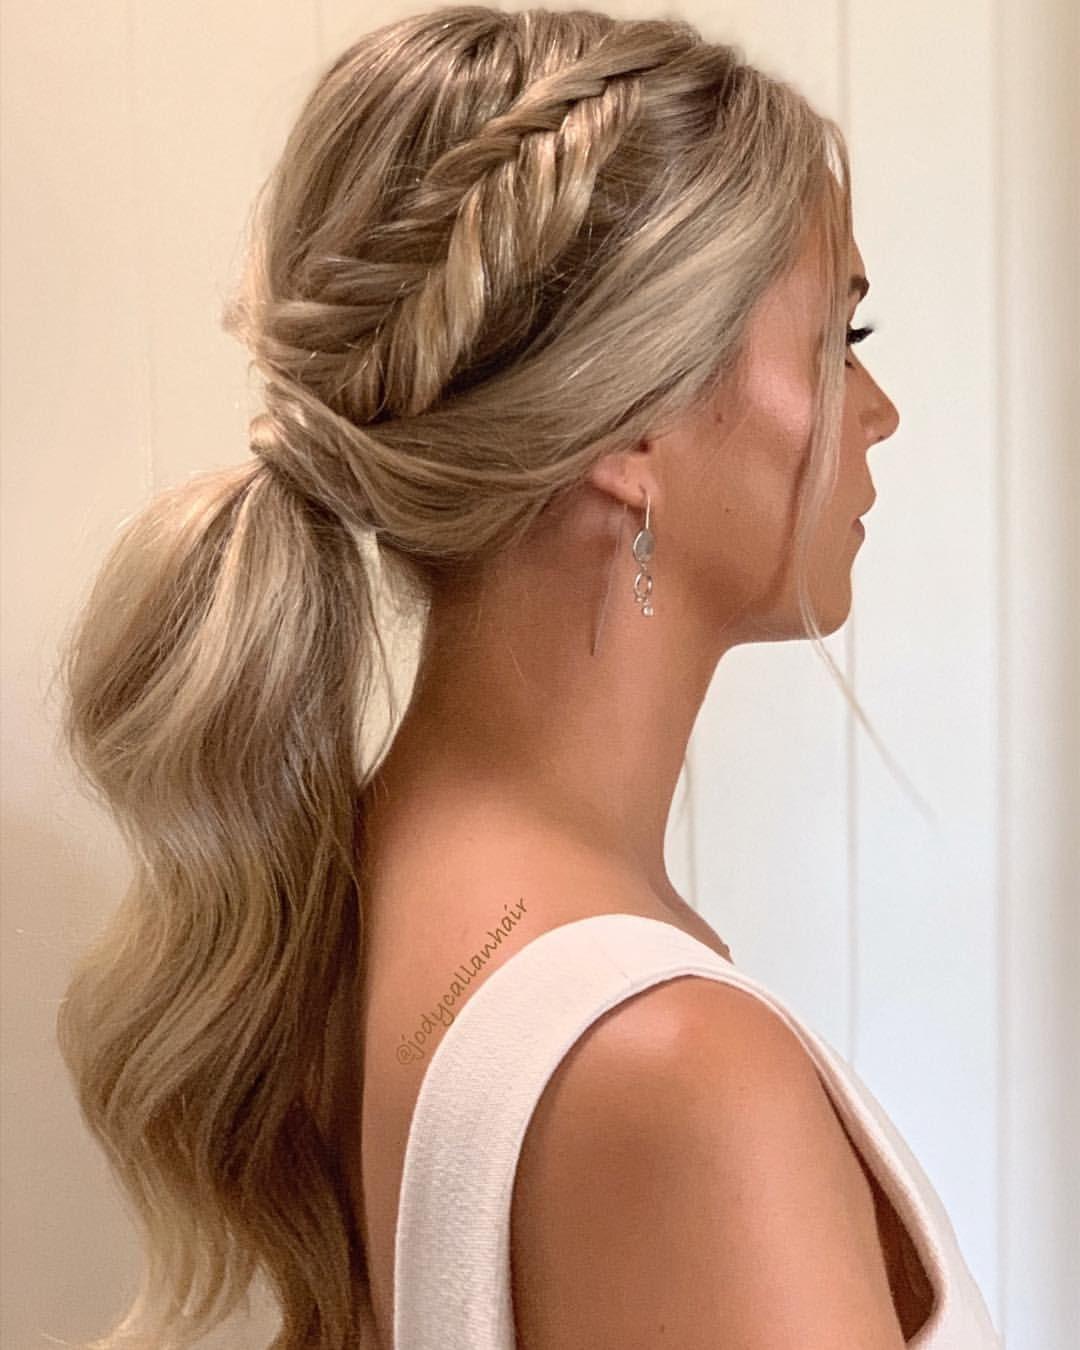 ponytail + fishtail braid ✨ bridesmaid hair inspo by